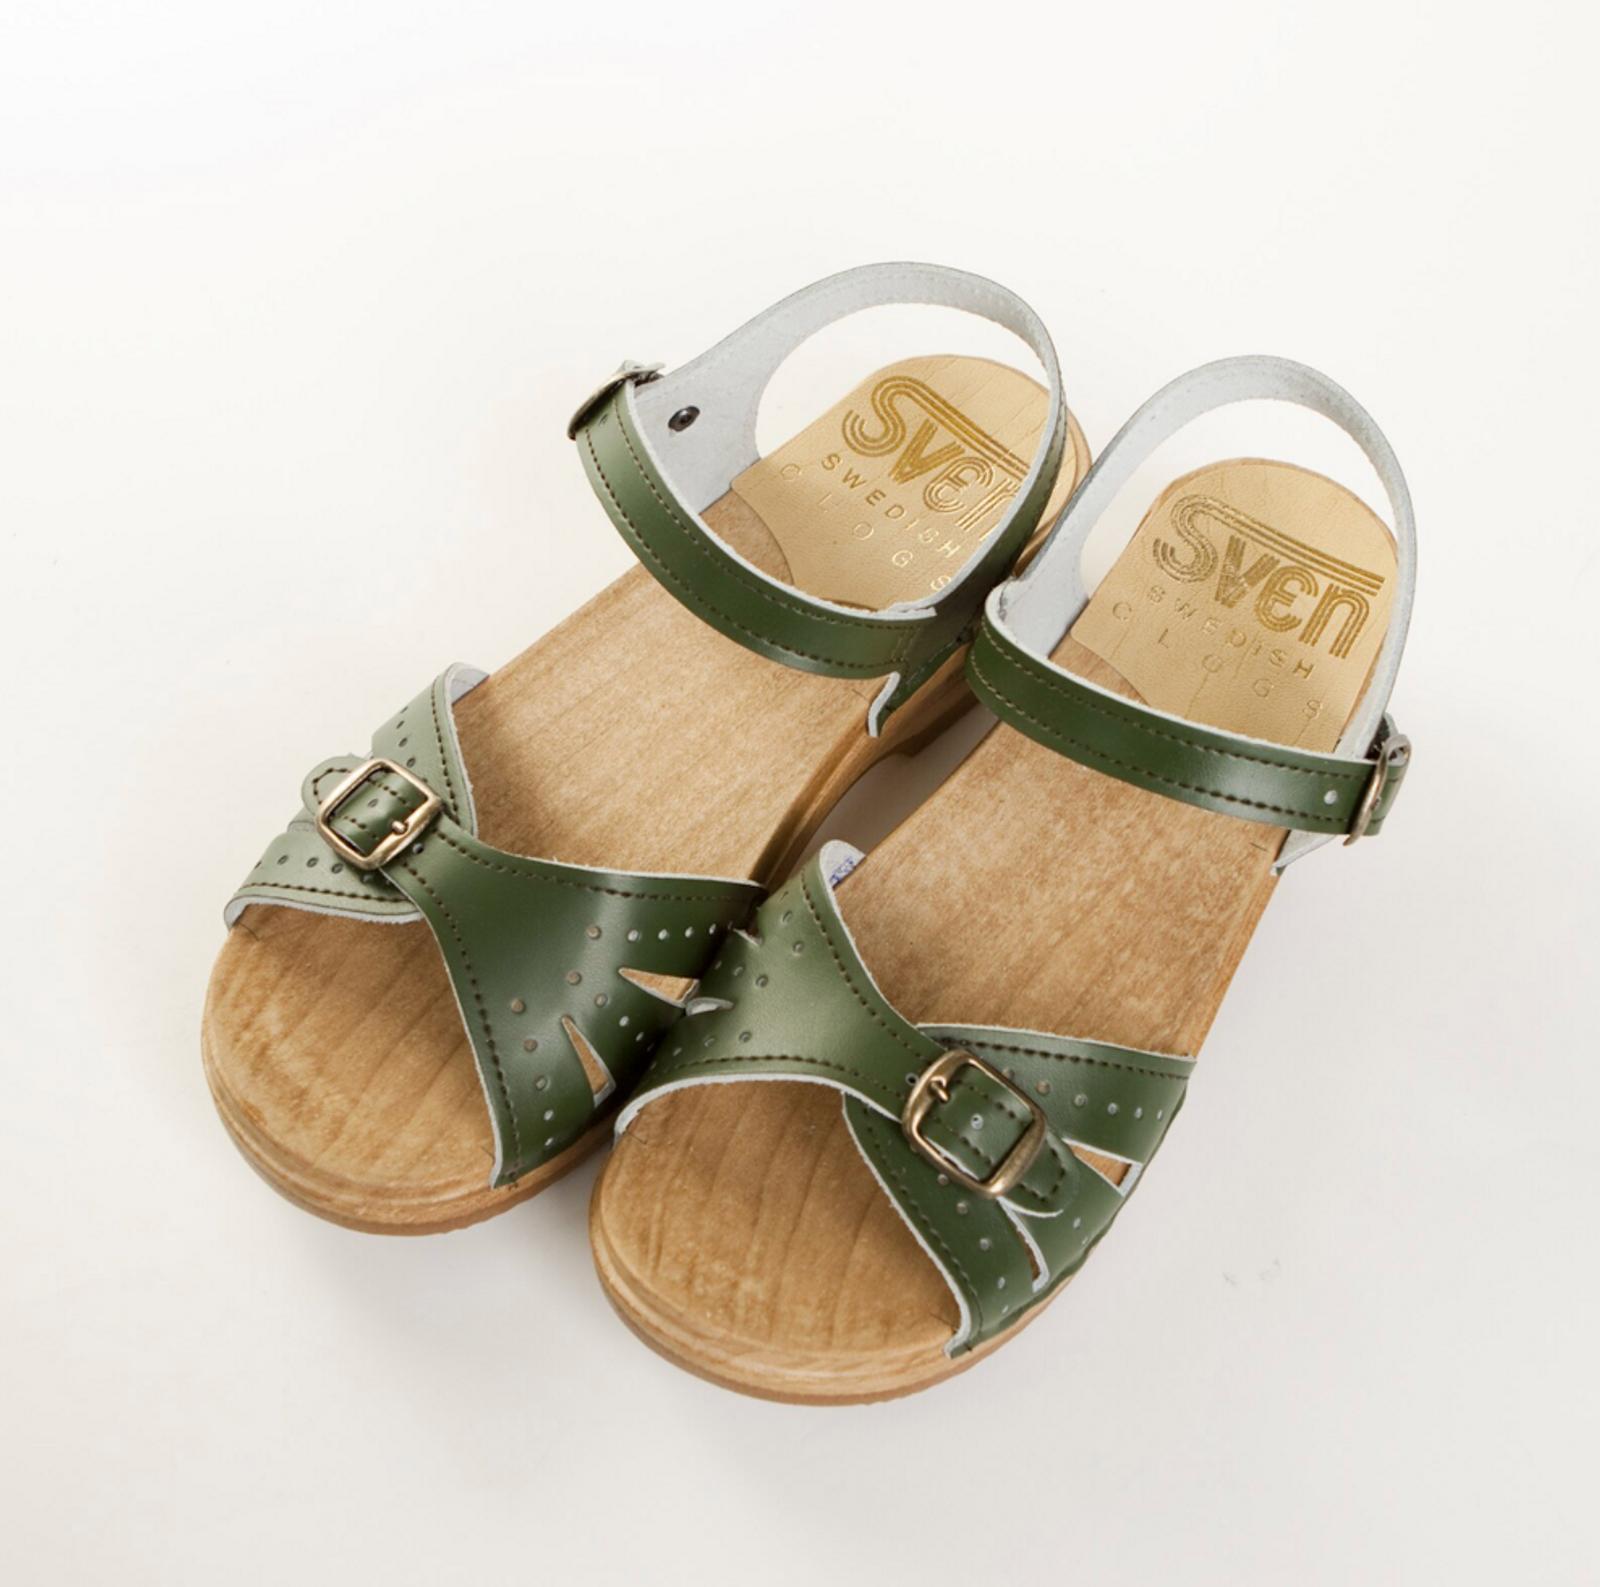 2 Buckle Sandal Clogs - Low Heel Bendable